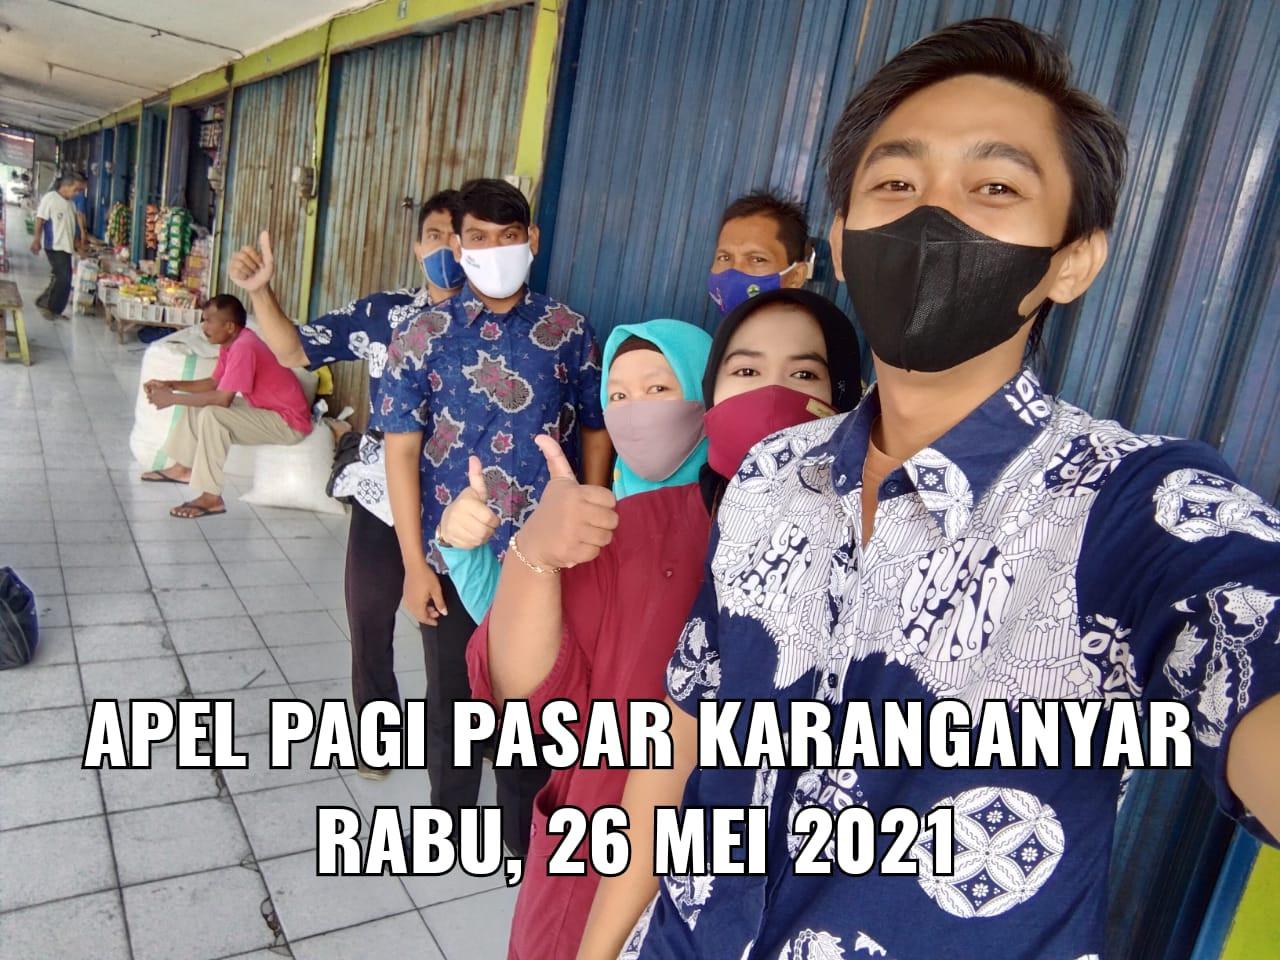 Penjagaan Pasar Kabupaten Demak DI UPTD Paswil V Pasar Karanganyar Serta Apel Pagi Protokol Kesehata